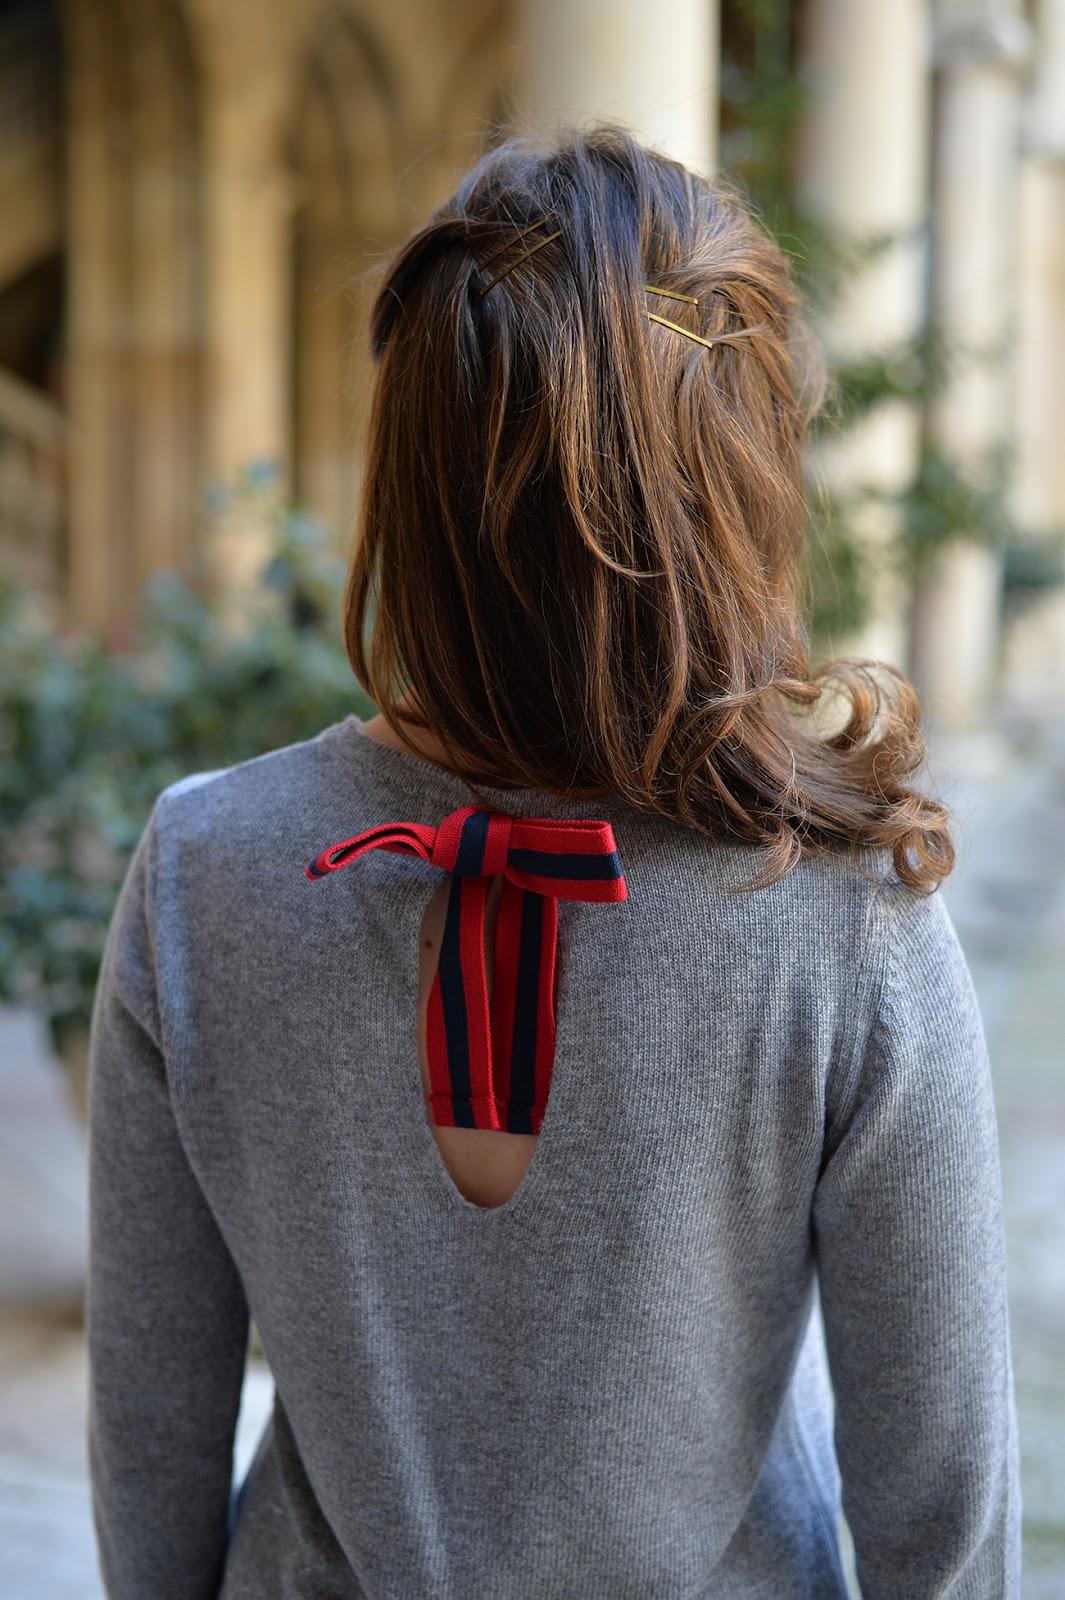 El Ganso grey sweater bow jersey gris lazo